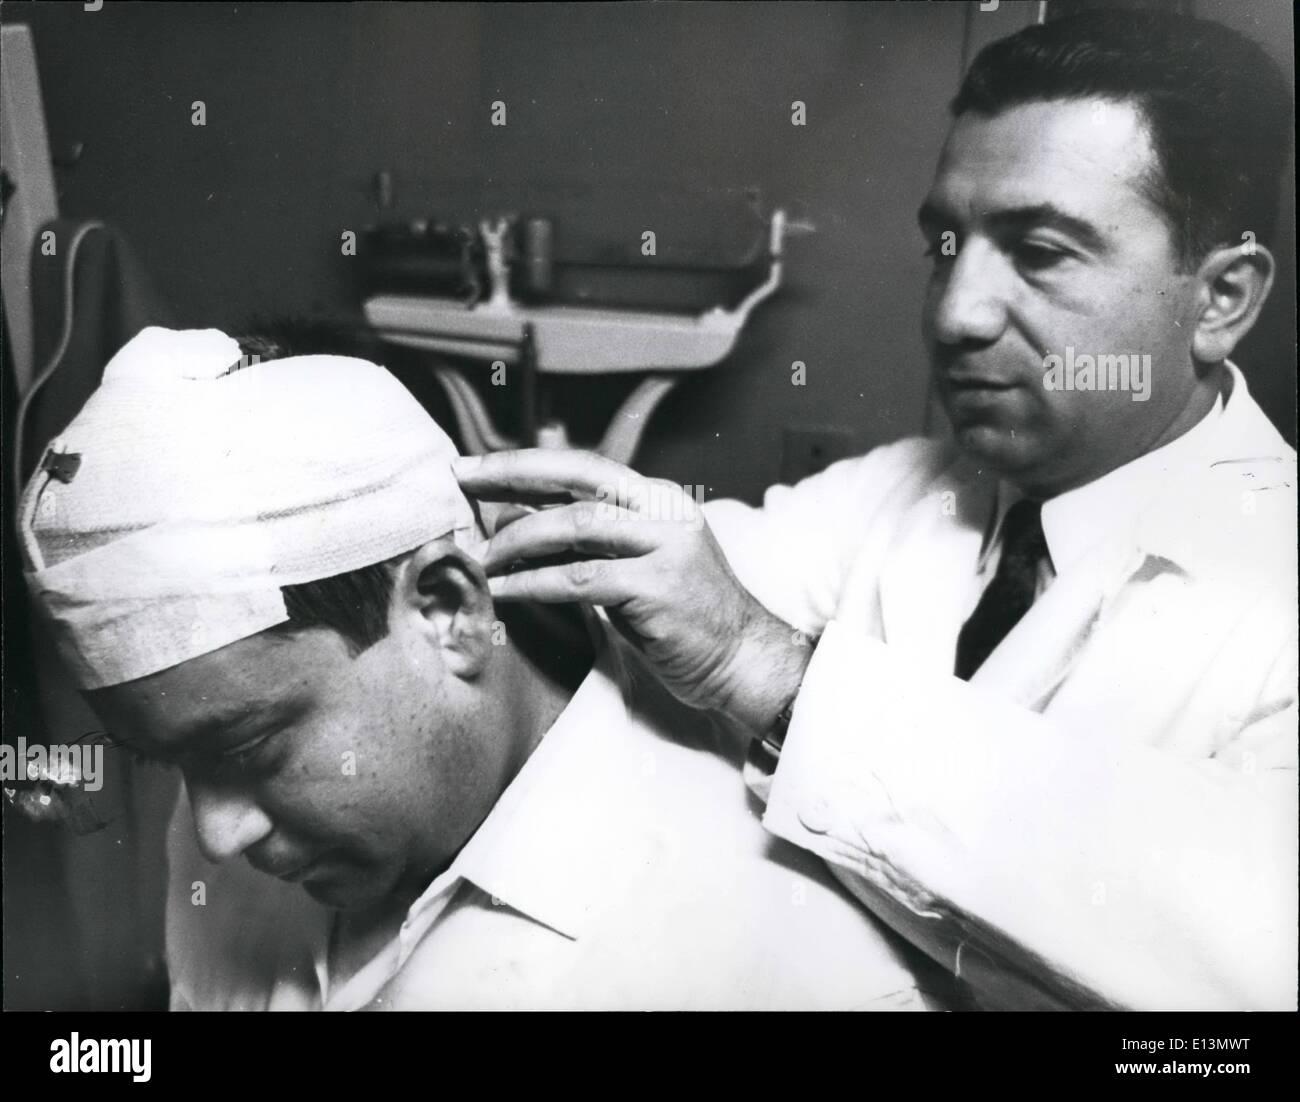 Mar. 22, 2012 - Hair Transplant Procedure. - Stock Image